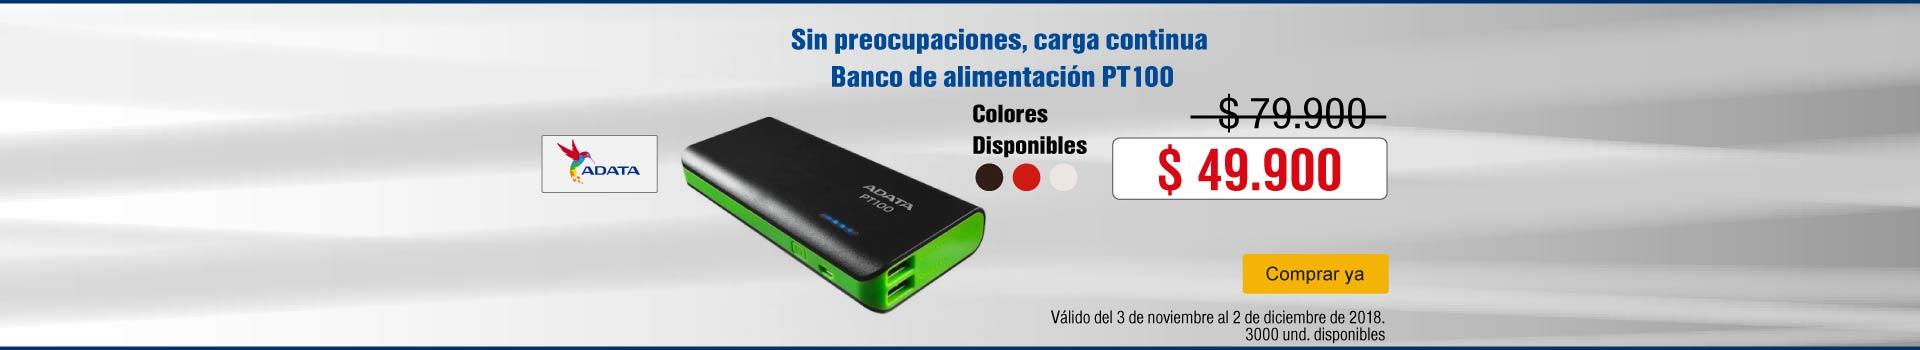 AK-KT-BCAT-16-accesorios-PP---baterias-recargables-adata-7nov